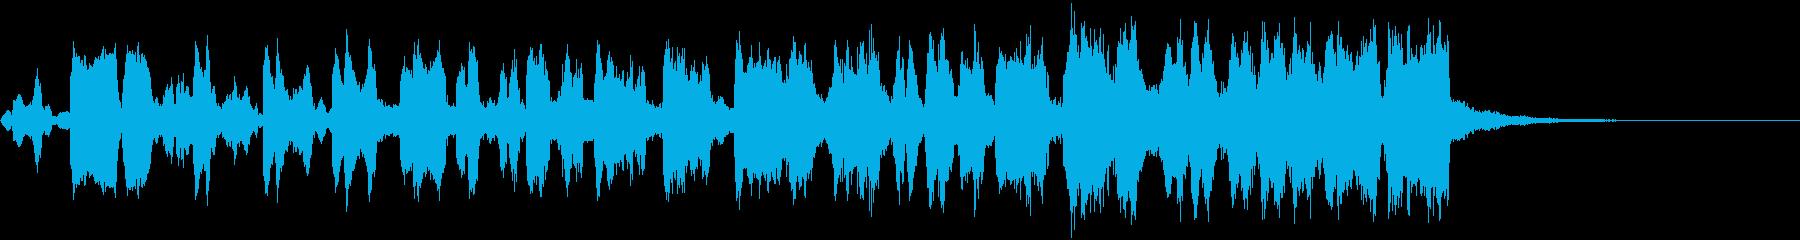 CINEMATIC RISER_16の再生済みの波形